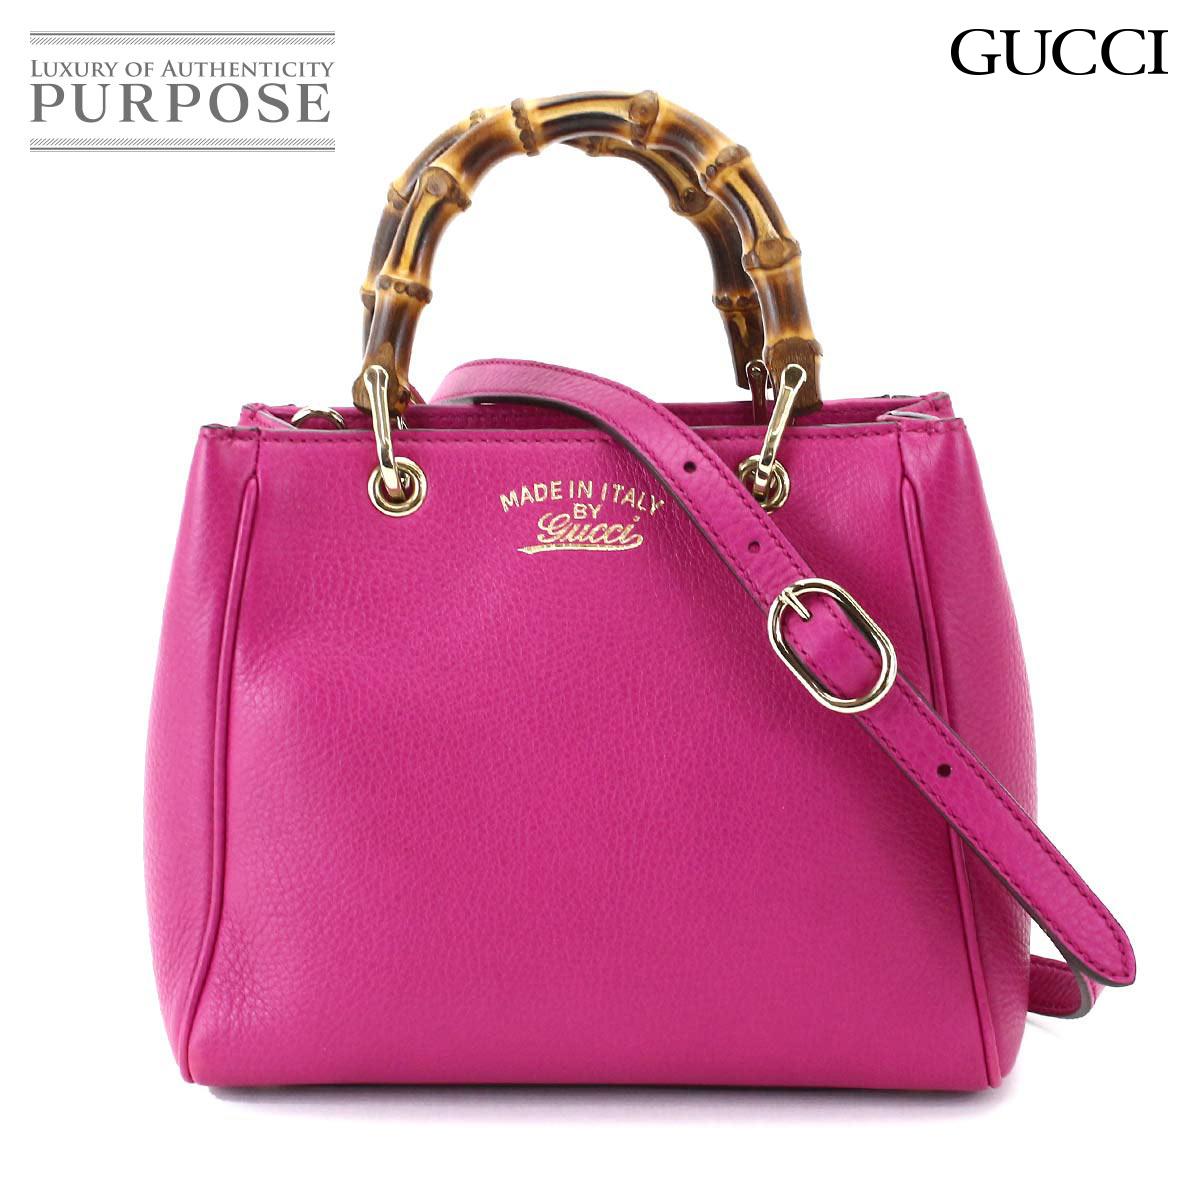 Gucci Bamboo Per Mini 2way Handbag Shoulder Bag Pink 368823 001998 Used Brand